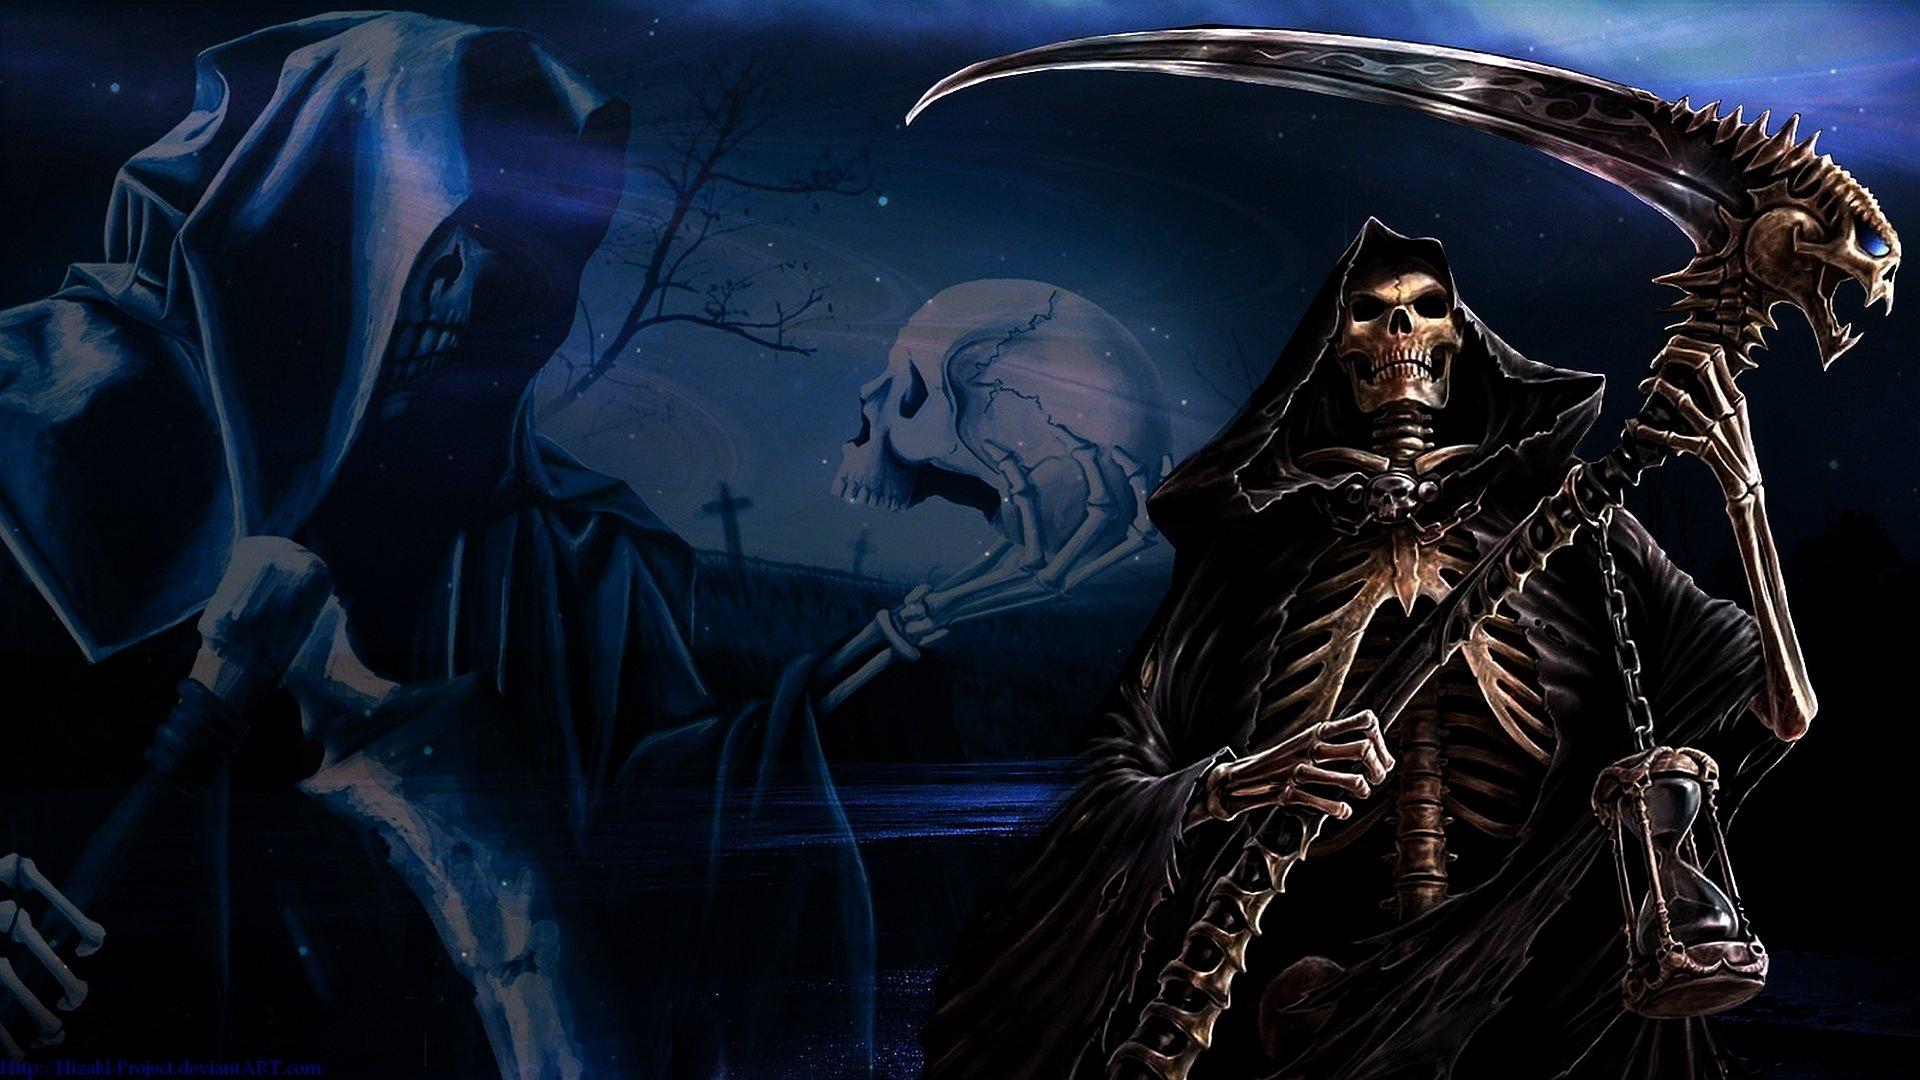 Grim Reaper HD Wallpaper | Background Image | 1920x1080 ...